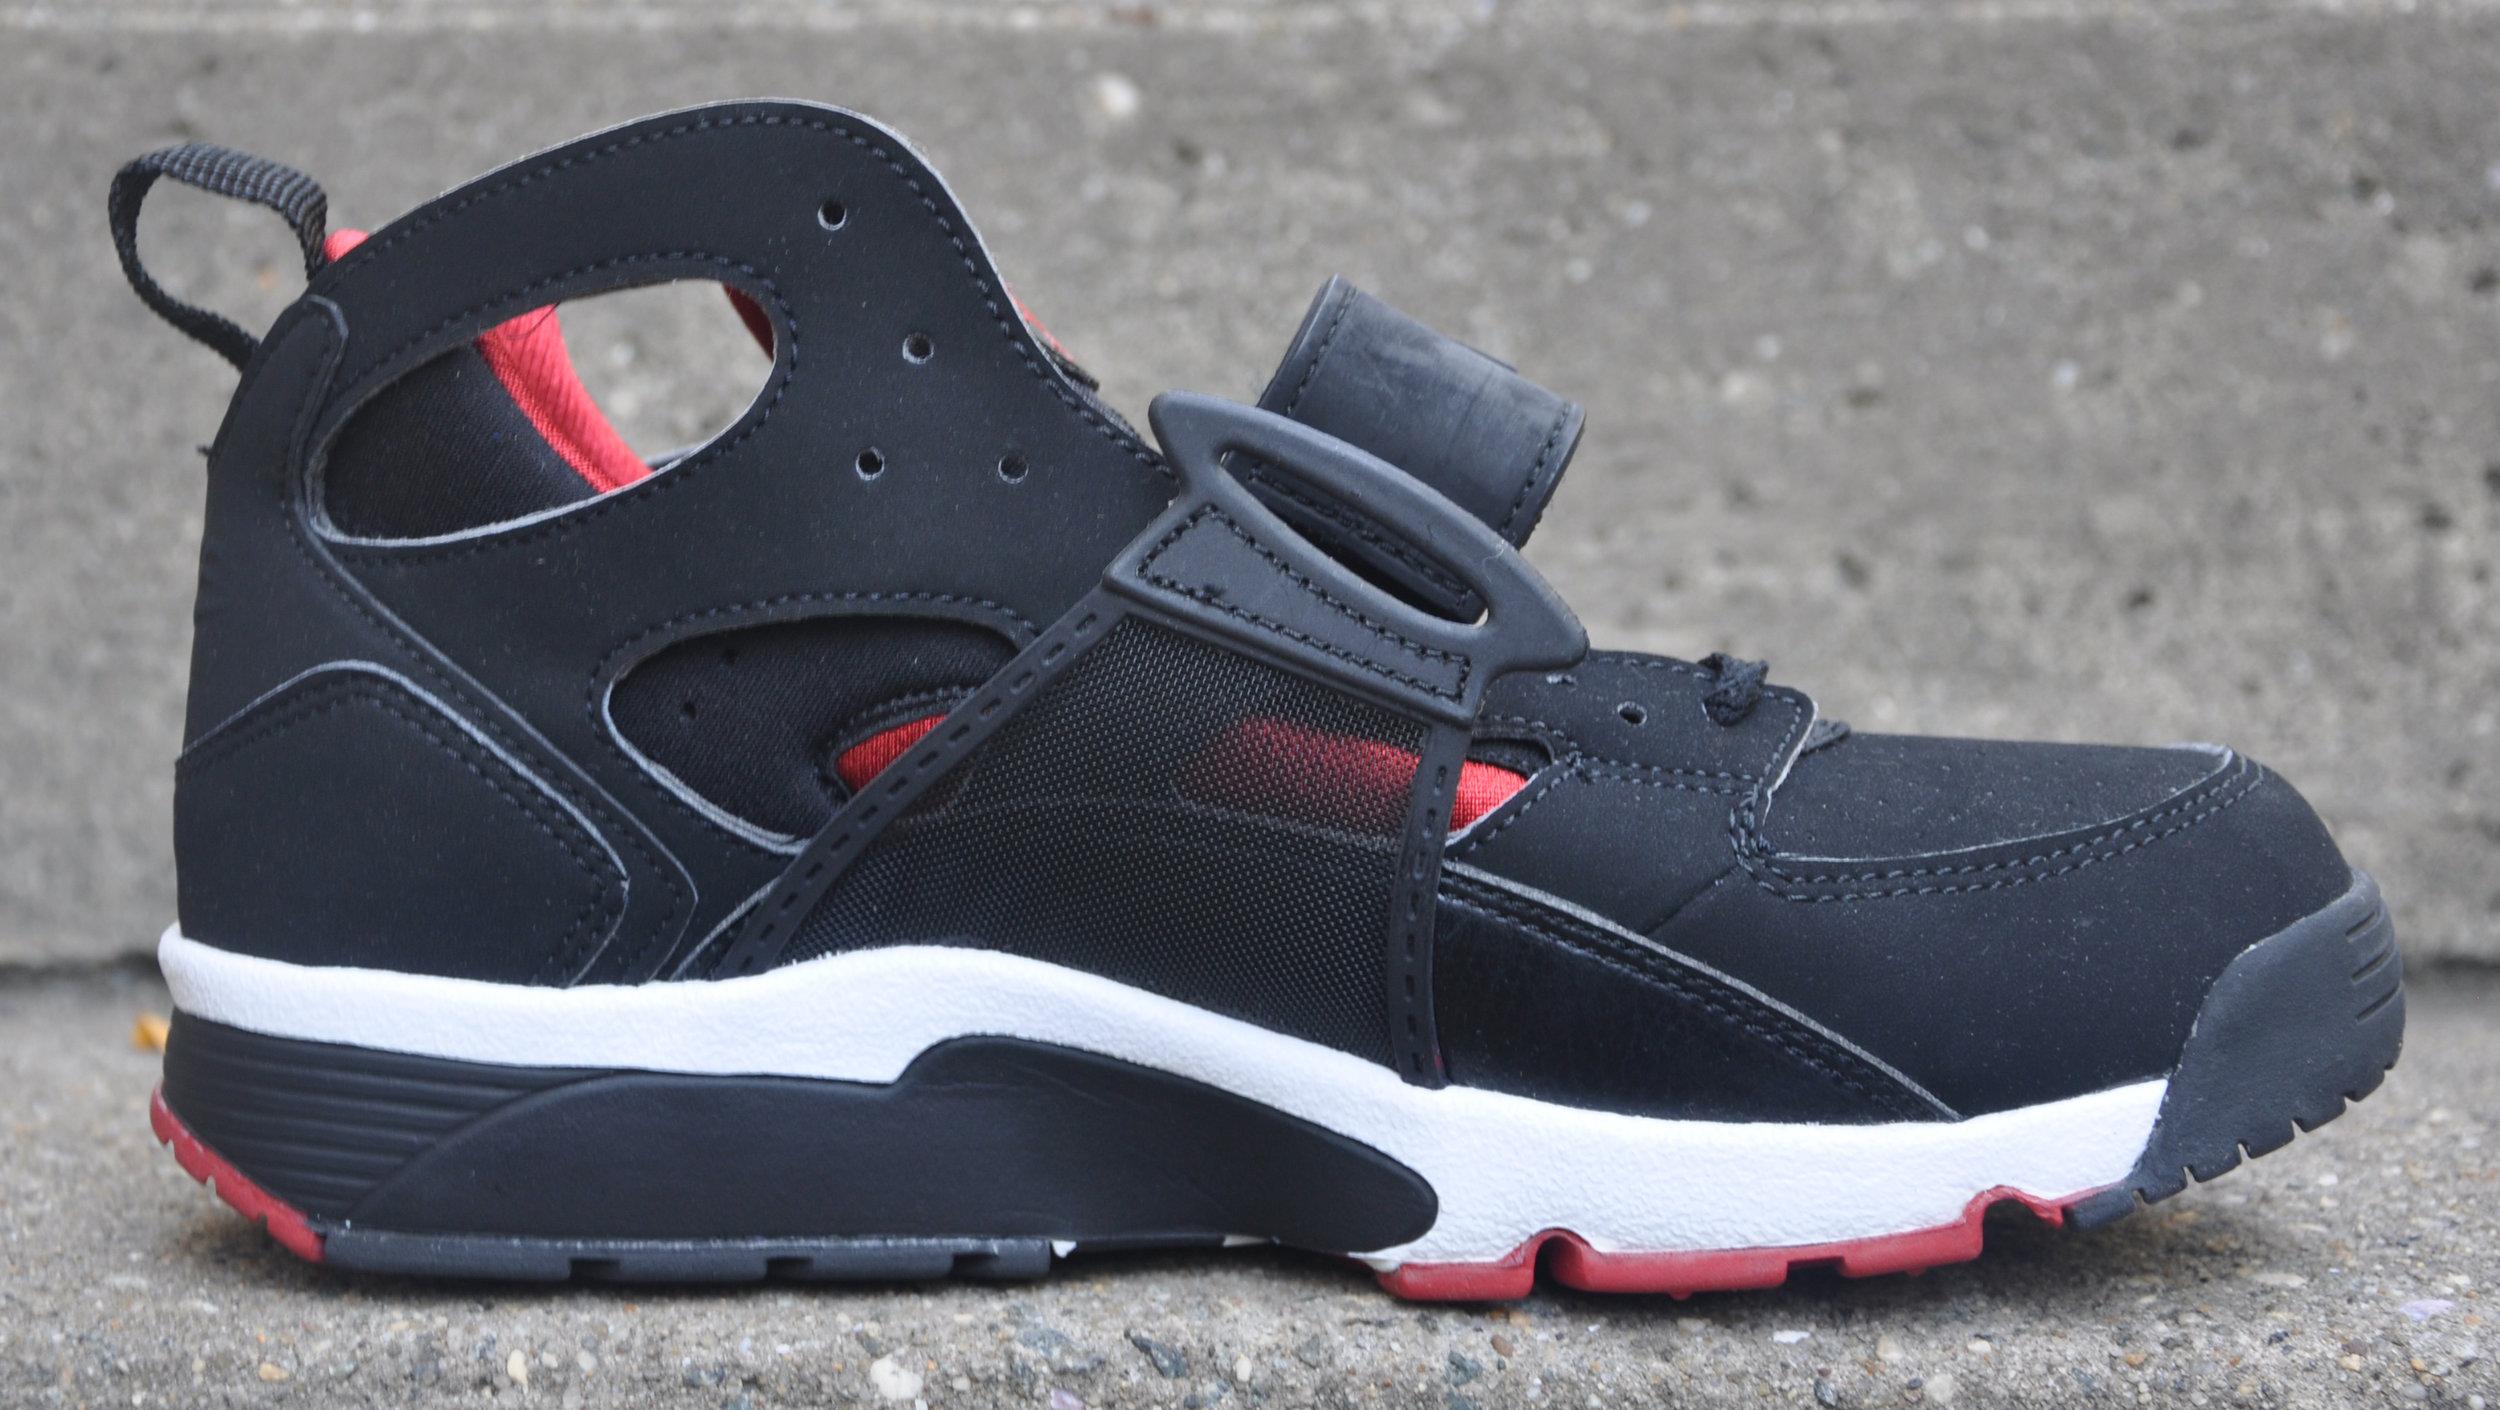 Nike Air Trainer Huarache Black / Red